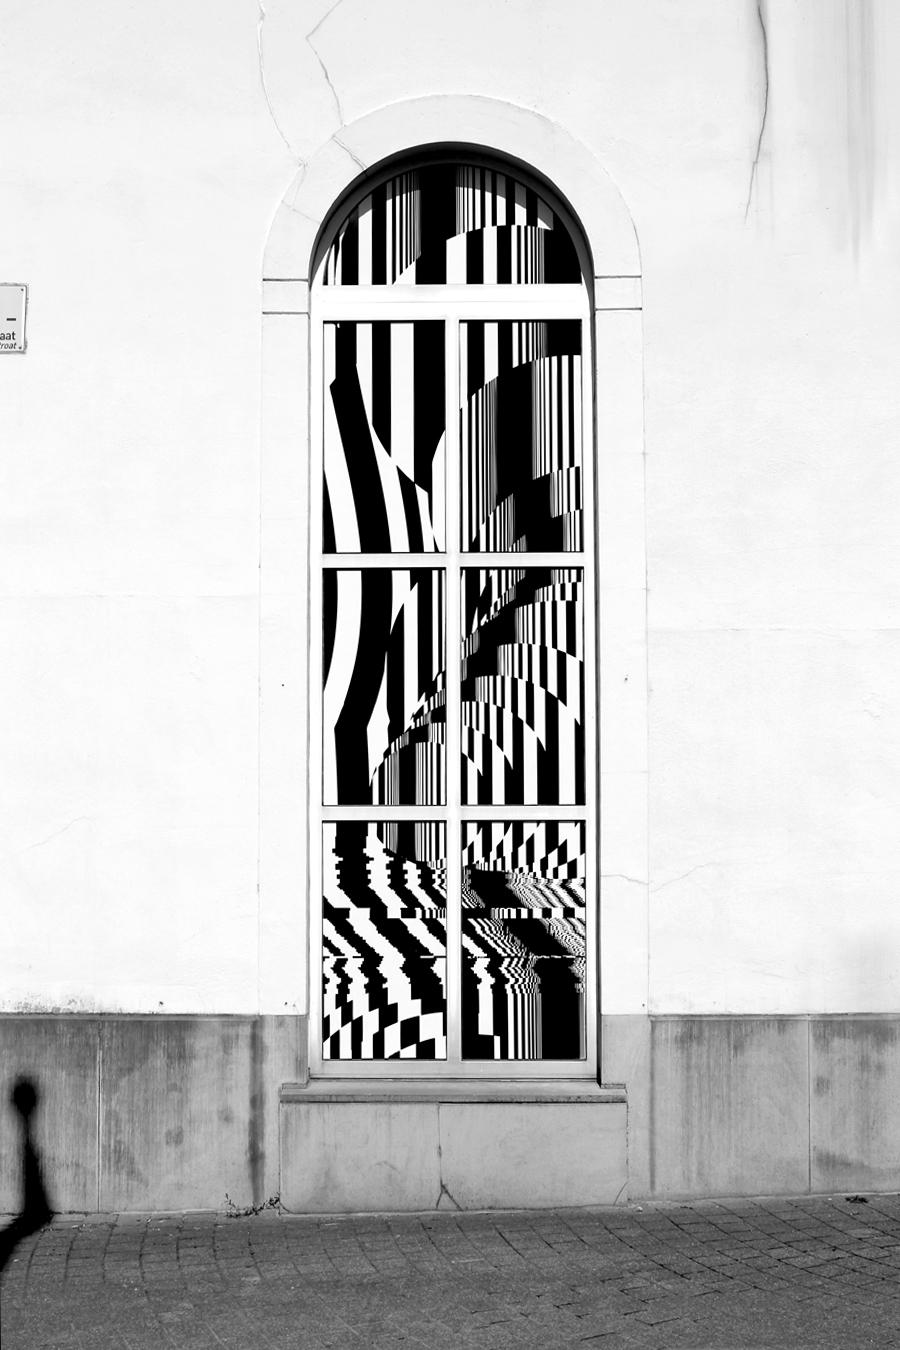 07_BIER-EN-BROOD_STUDIO-RUWEDATA_ION-II_B_900px